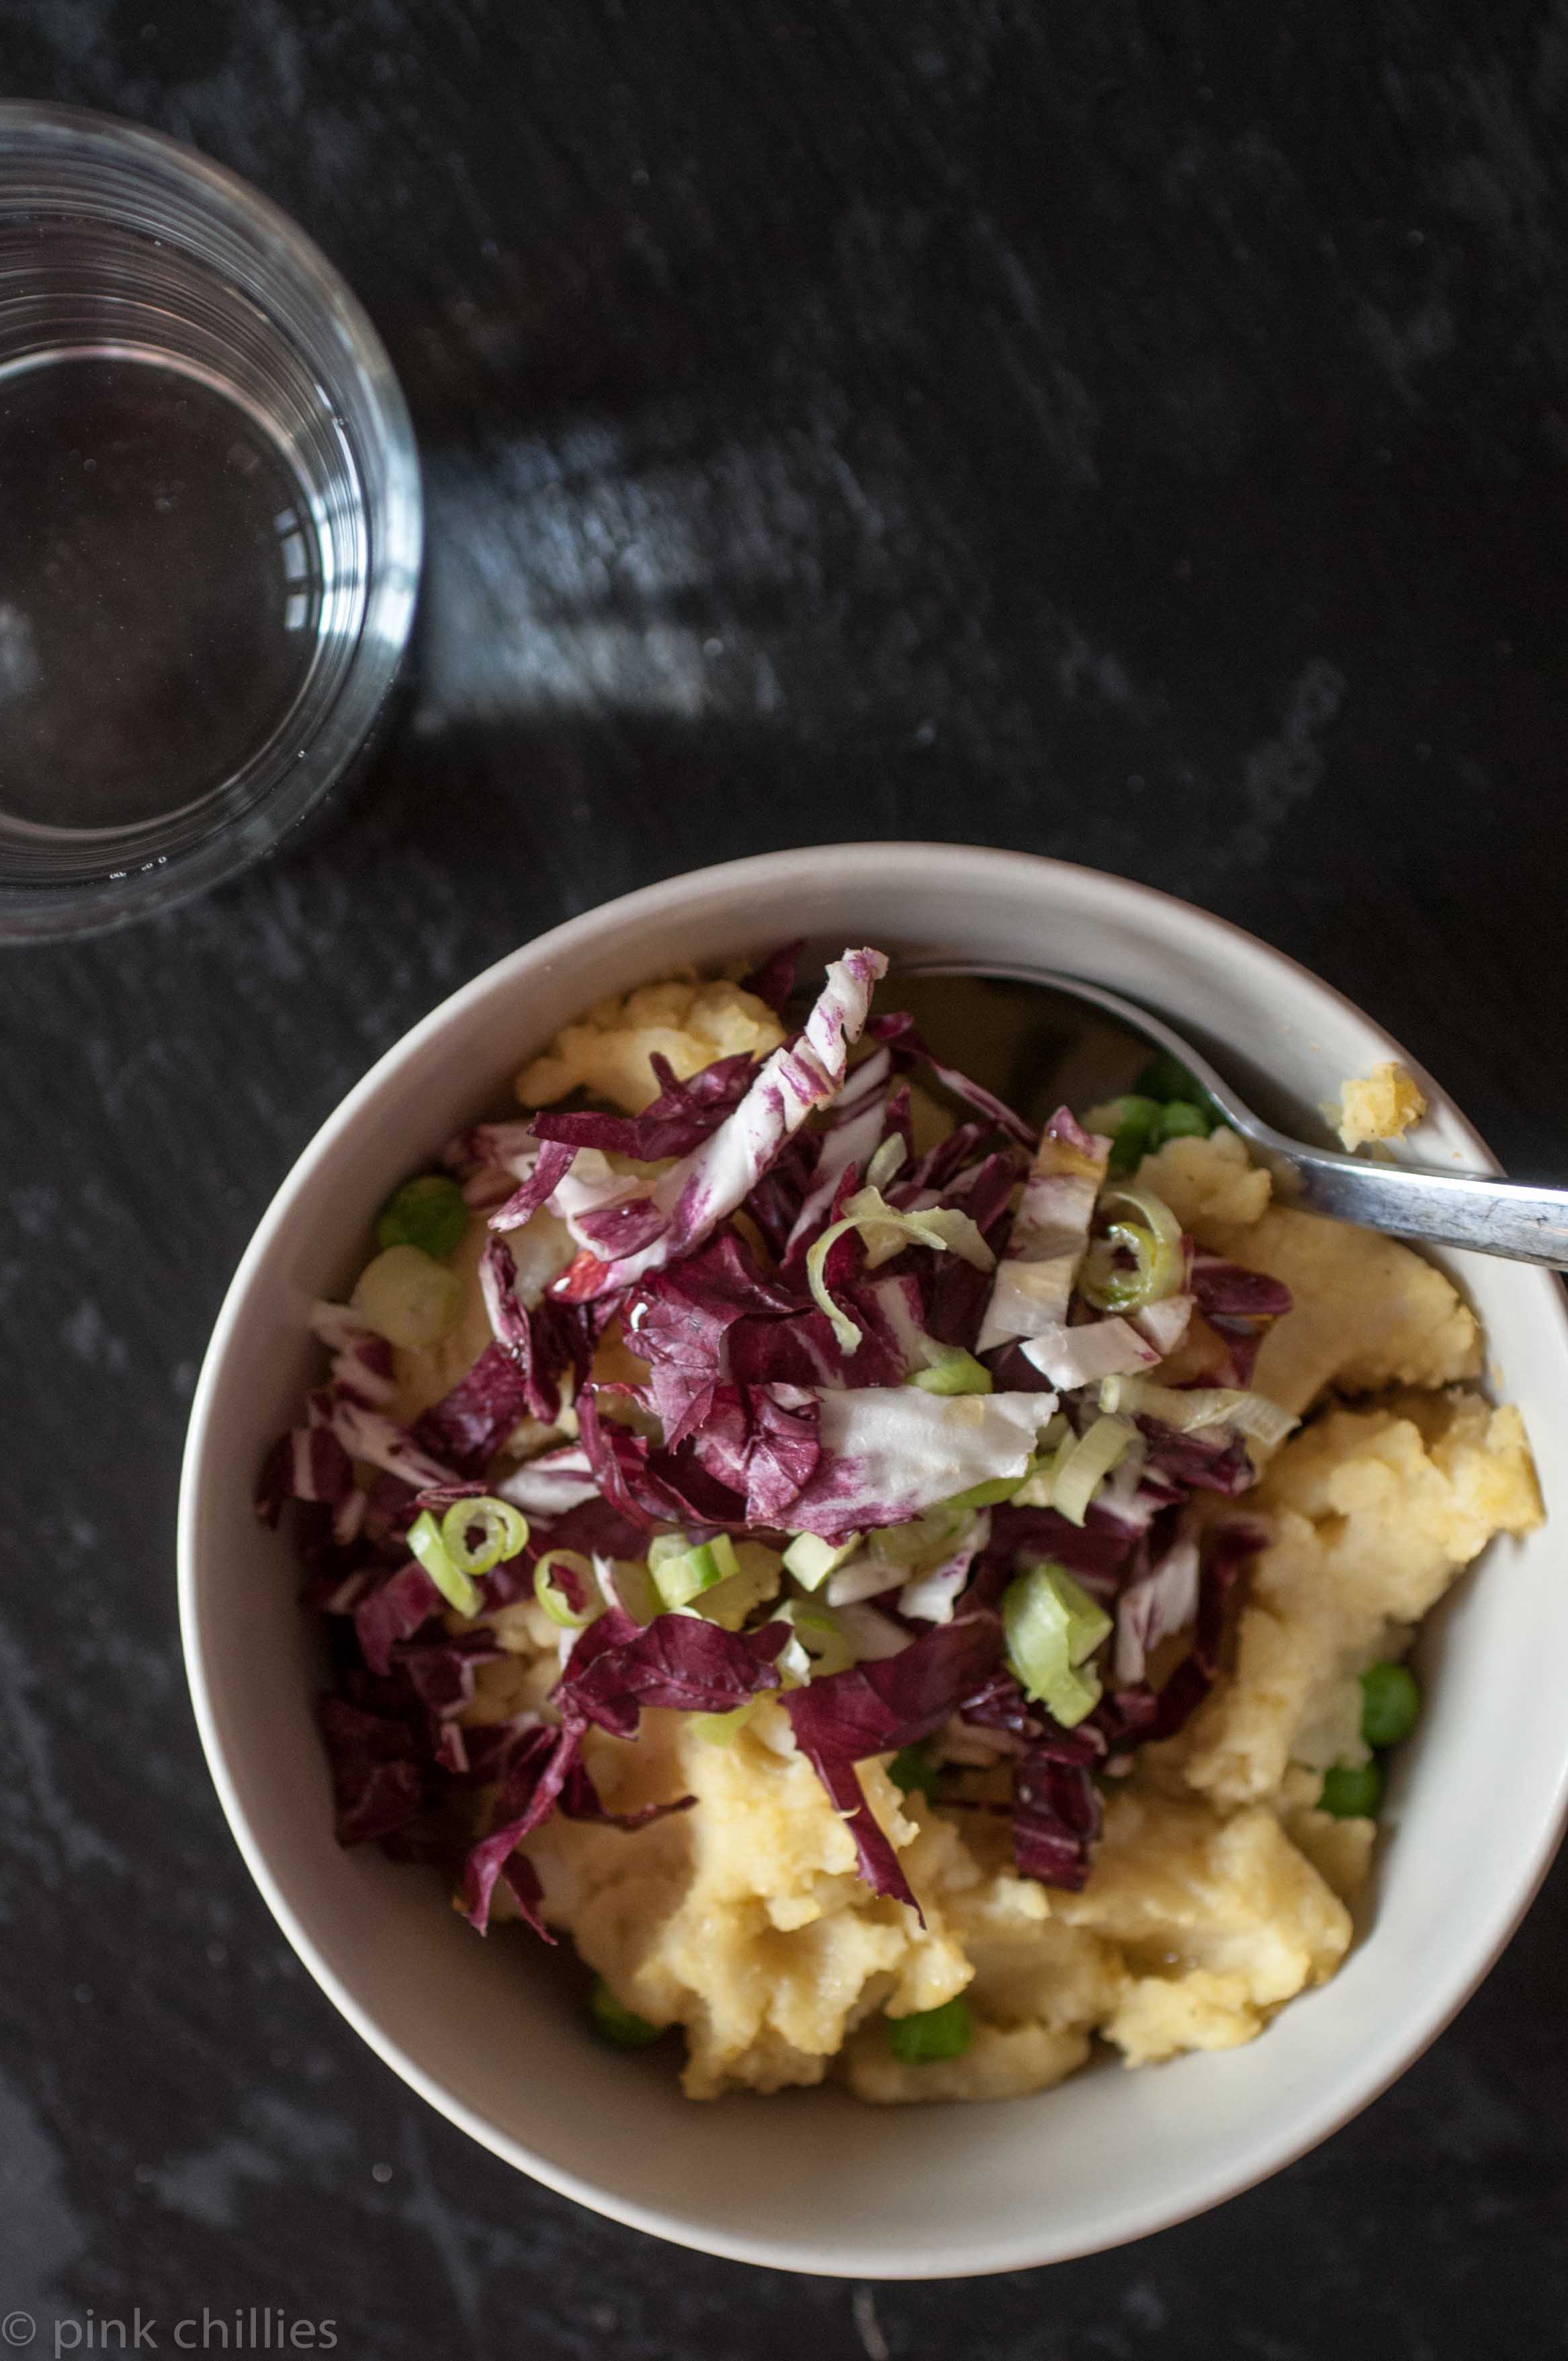 Resteessen Kartoffelstampfe